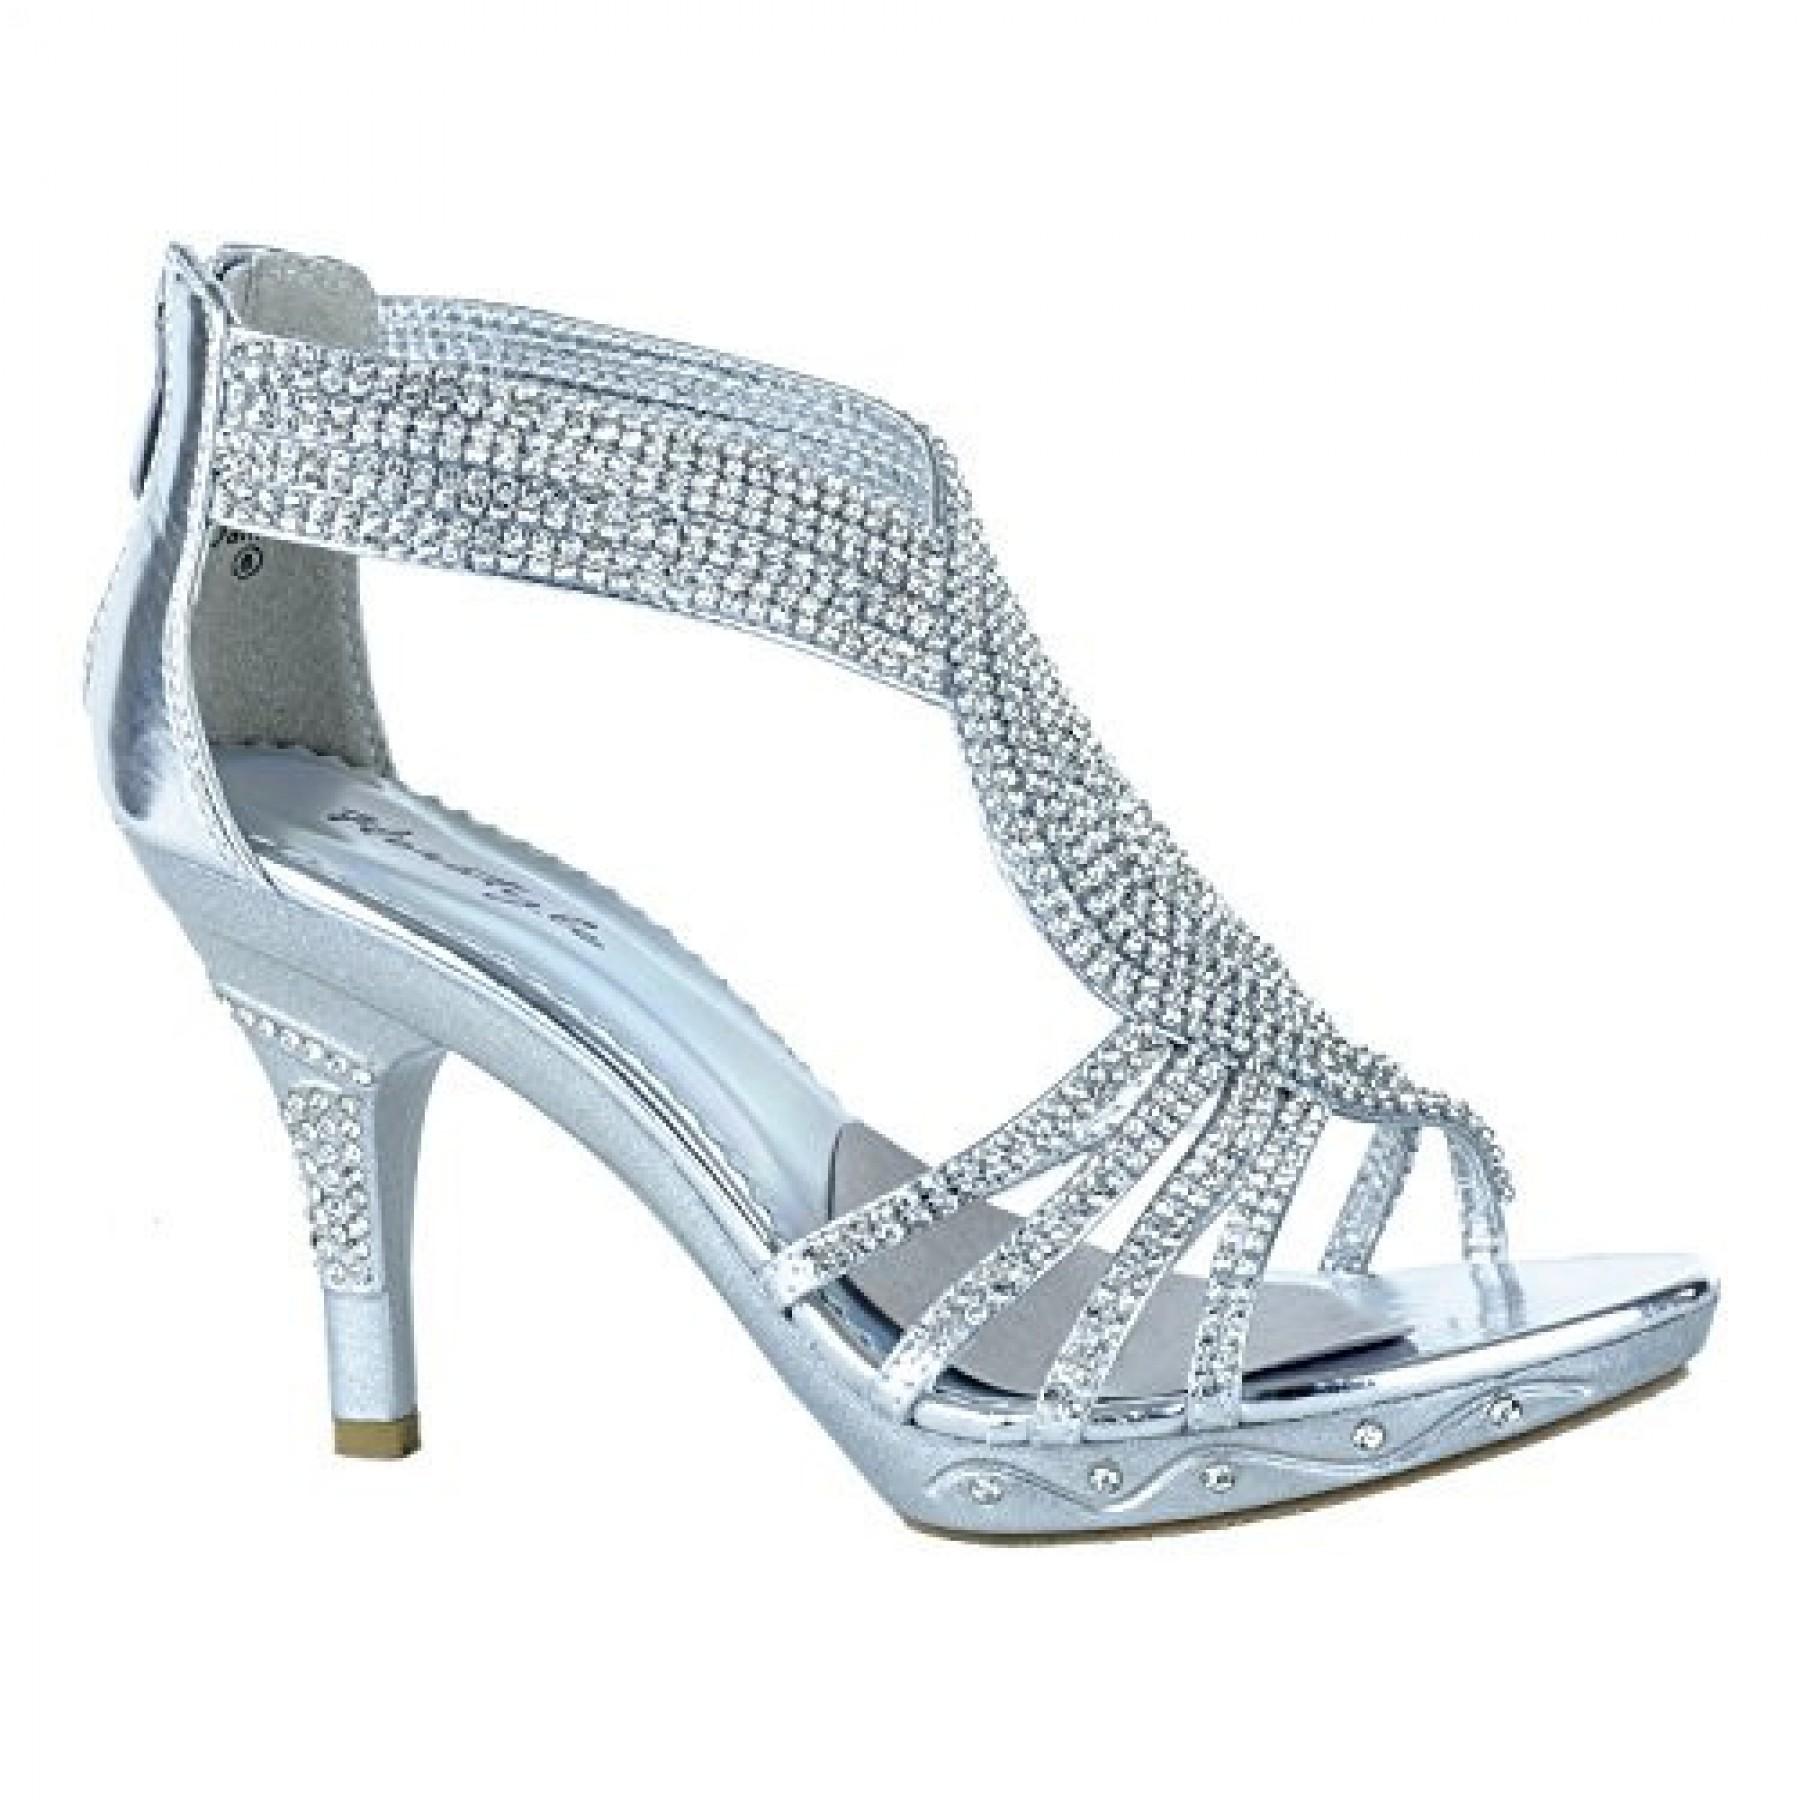 Women's Silver Dalinda 3.5-inch Pump Sandal with Sparkling Rhinestone T-Strap